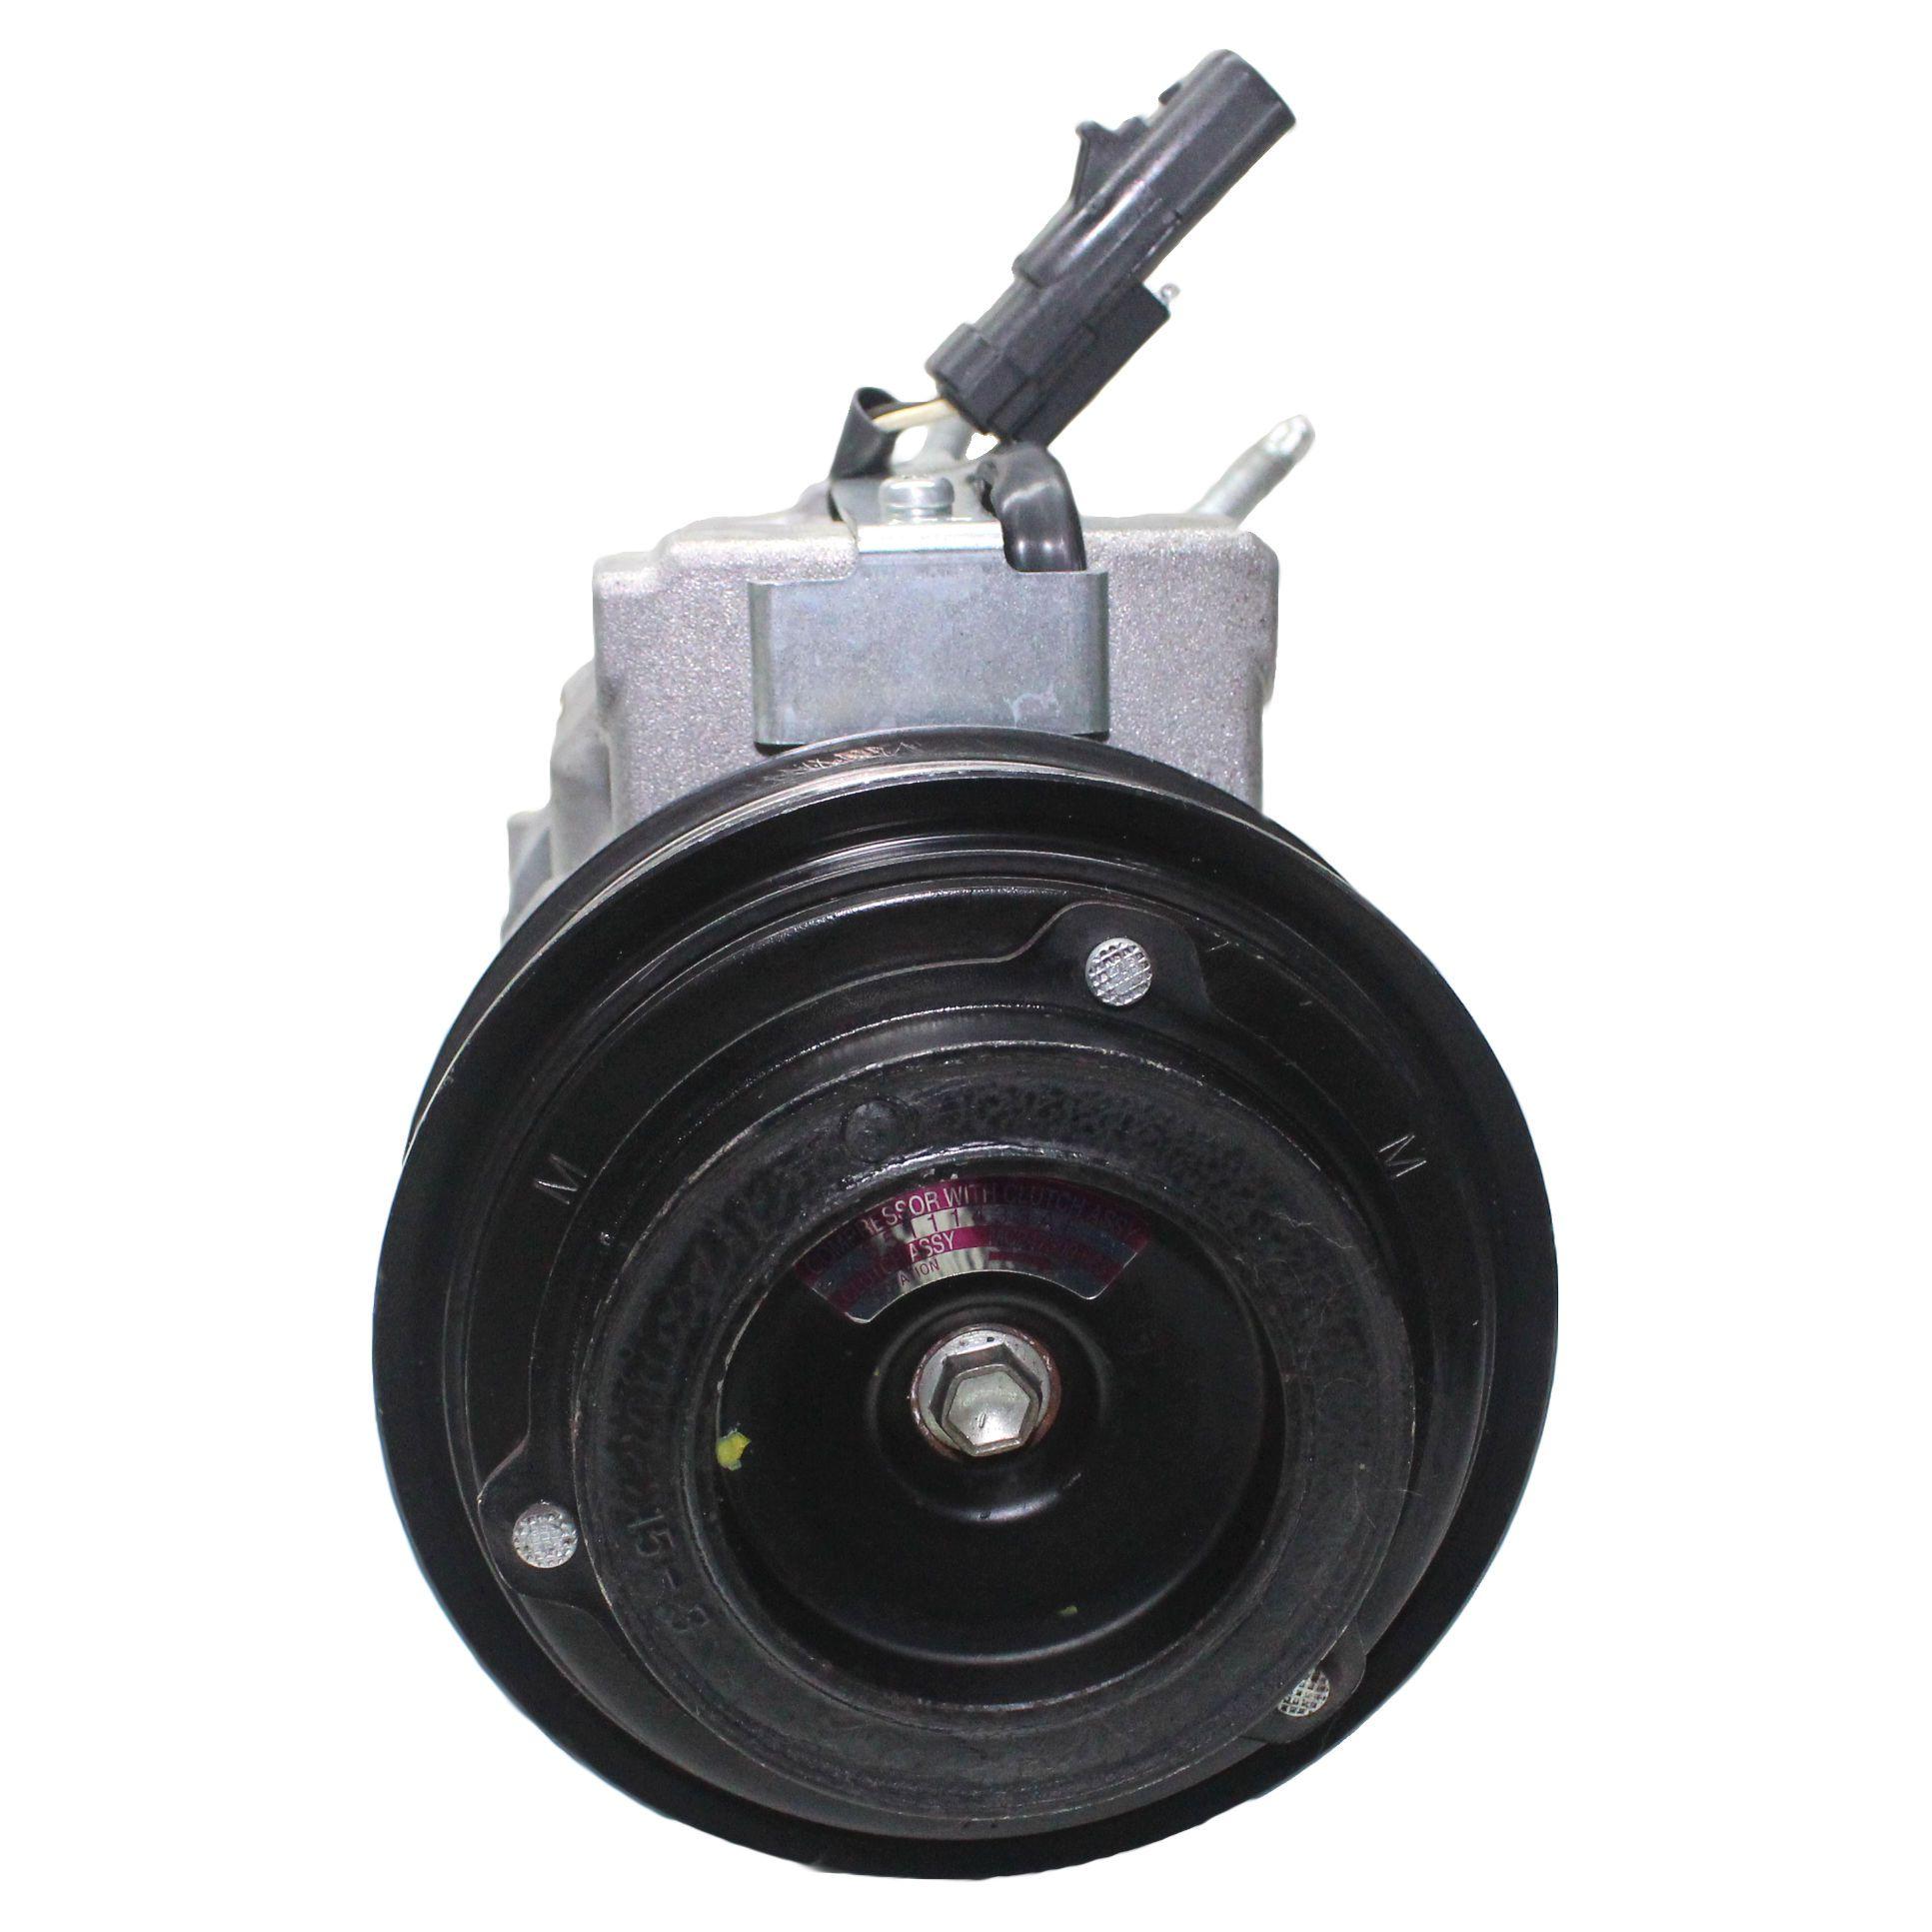 Compressor Ar Condicionado Denso Freemont 2.4 MC247300583 / 4472800152 - Recon